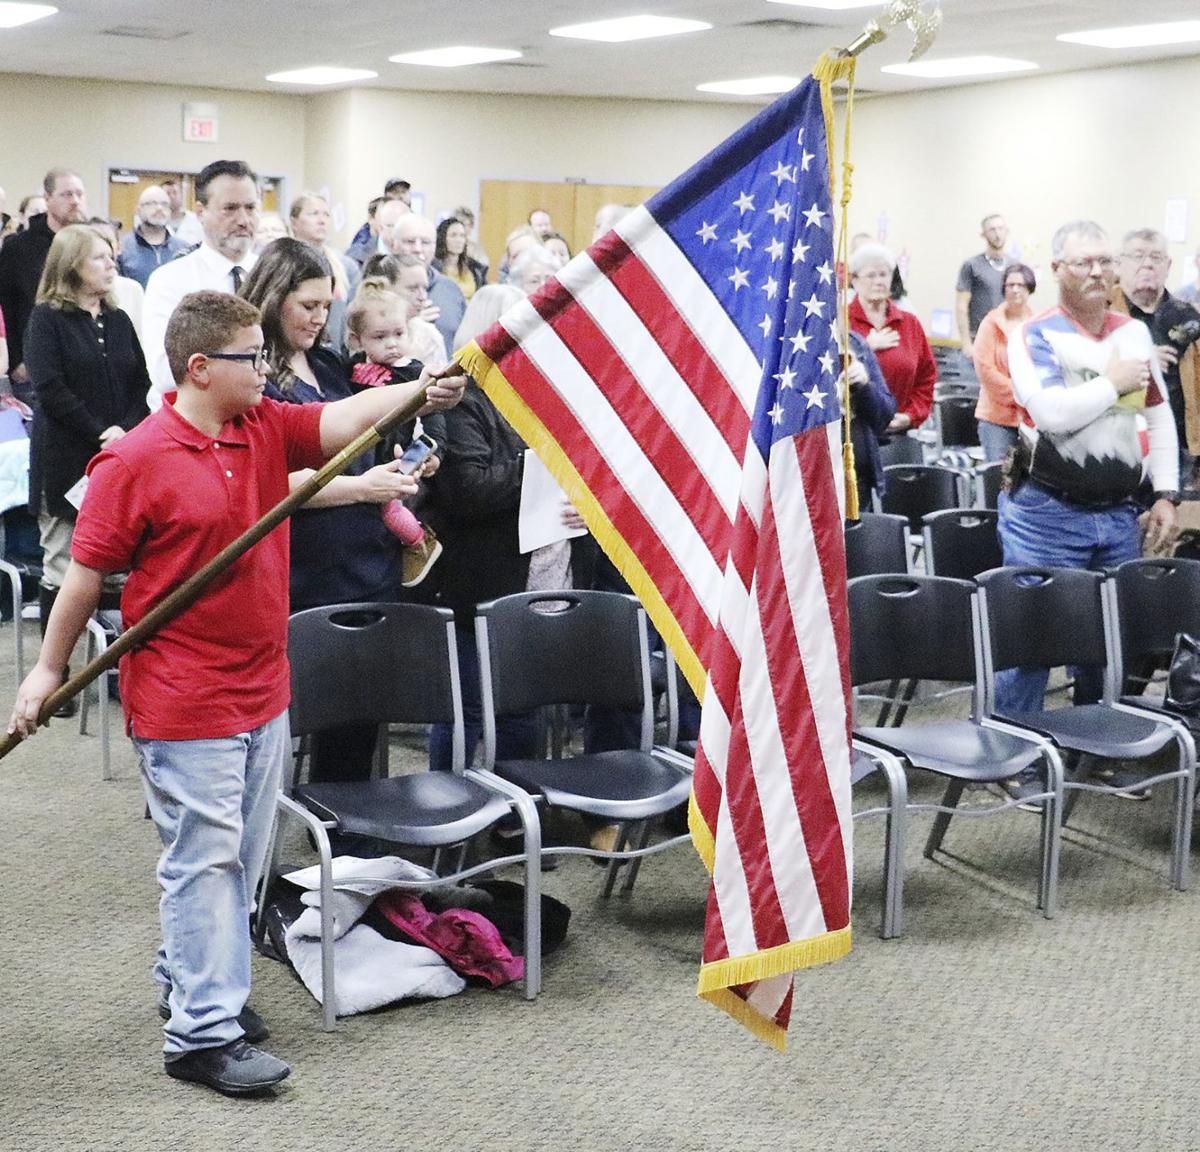 Veterans' salute